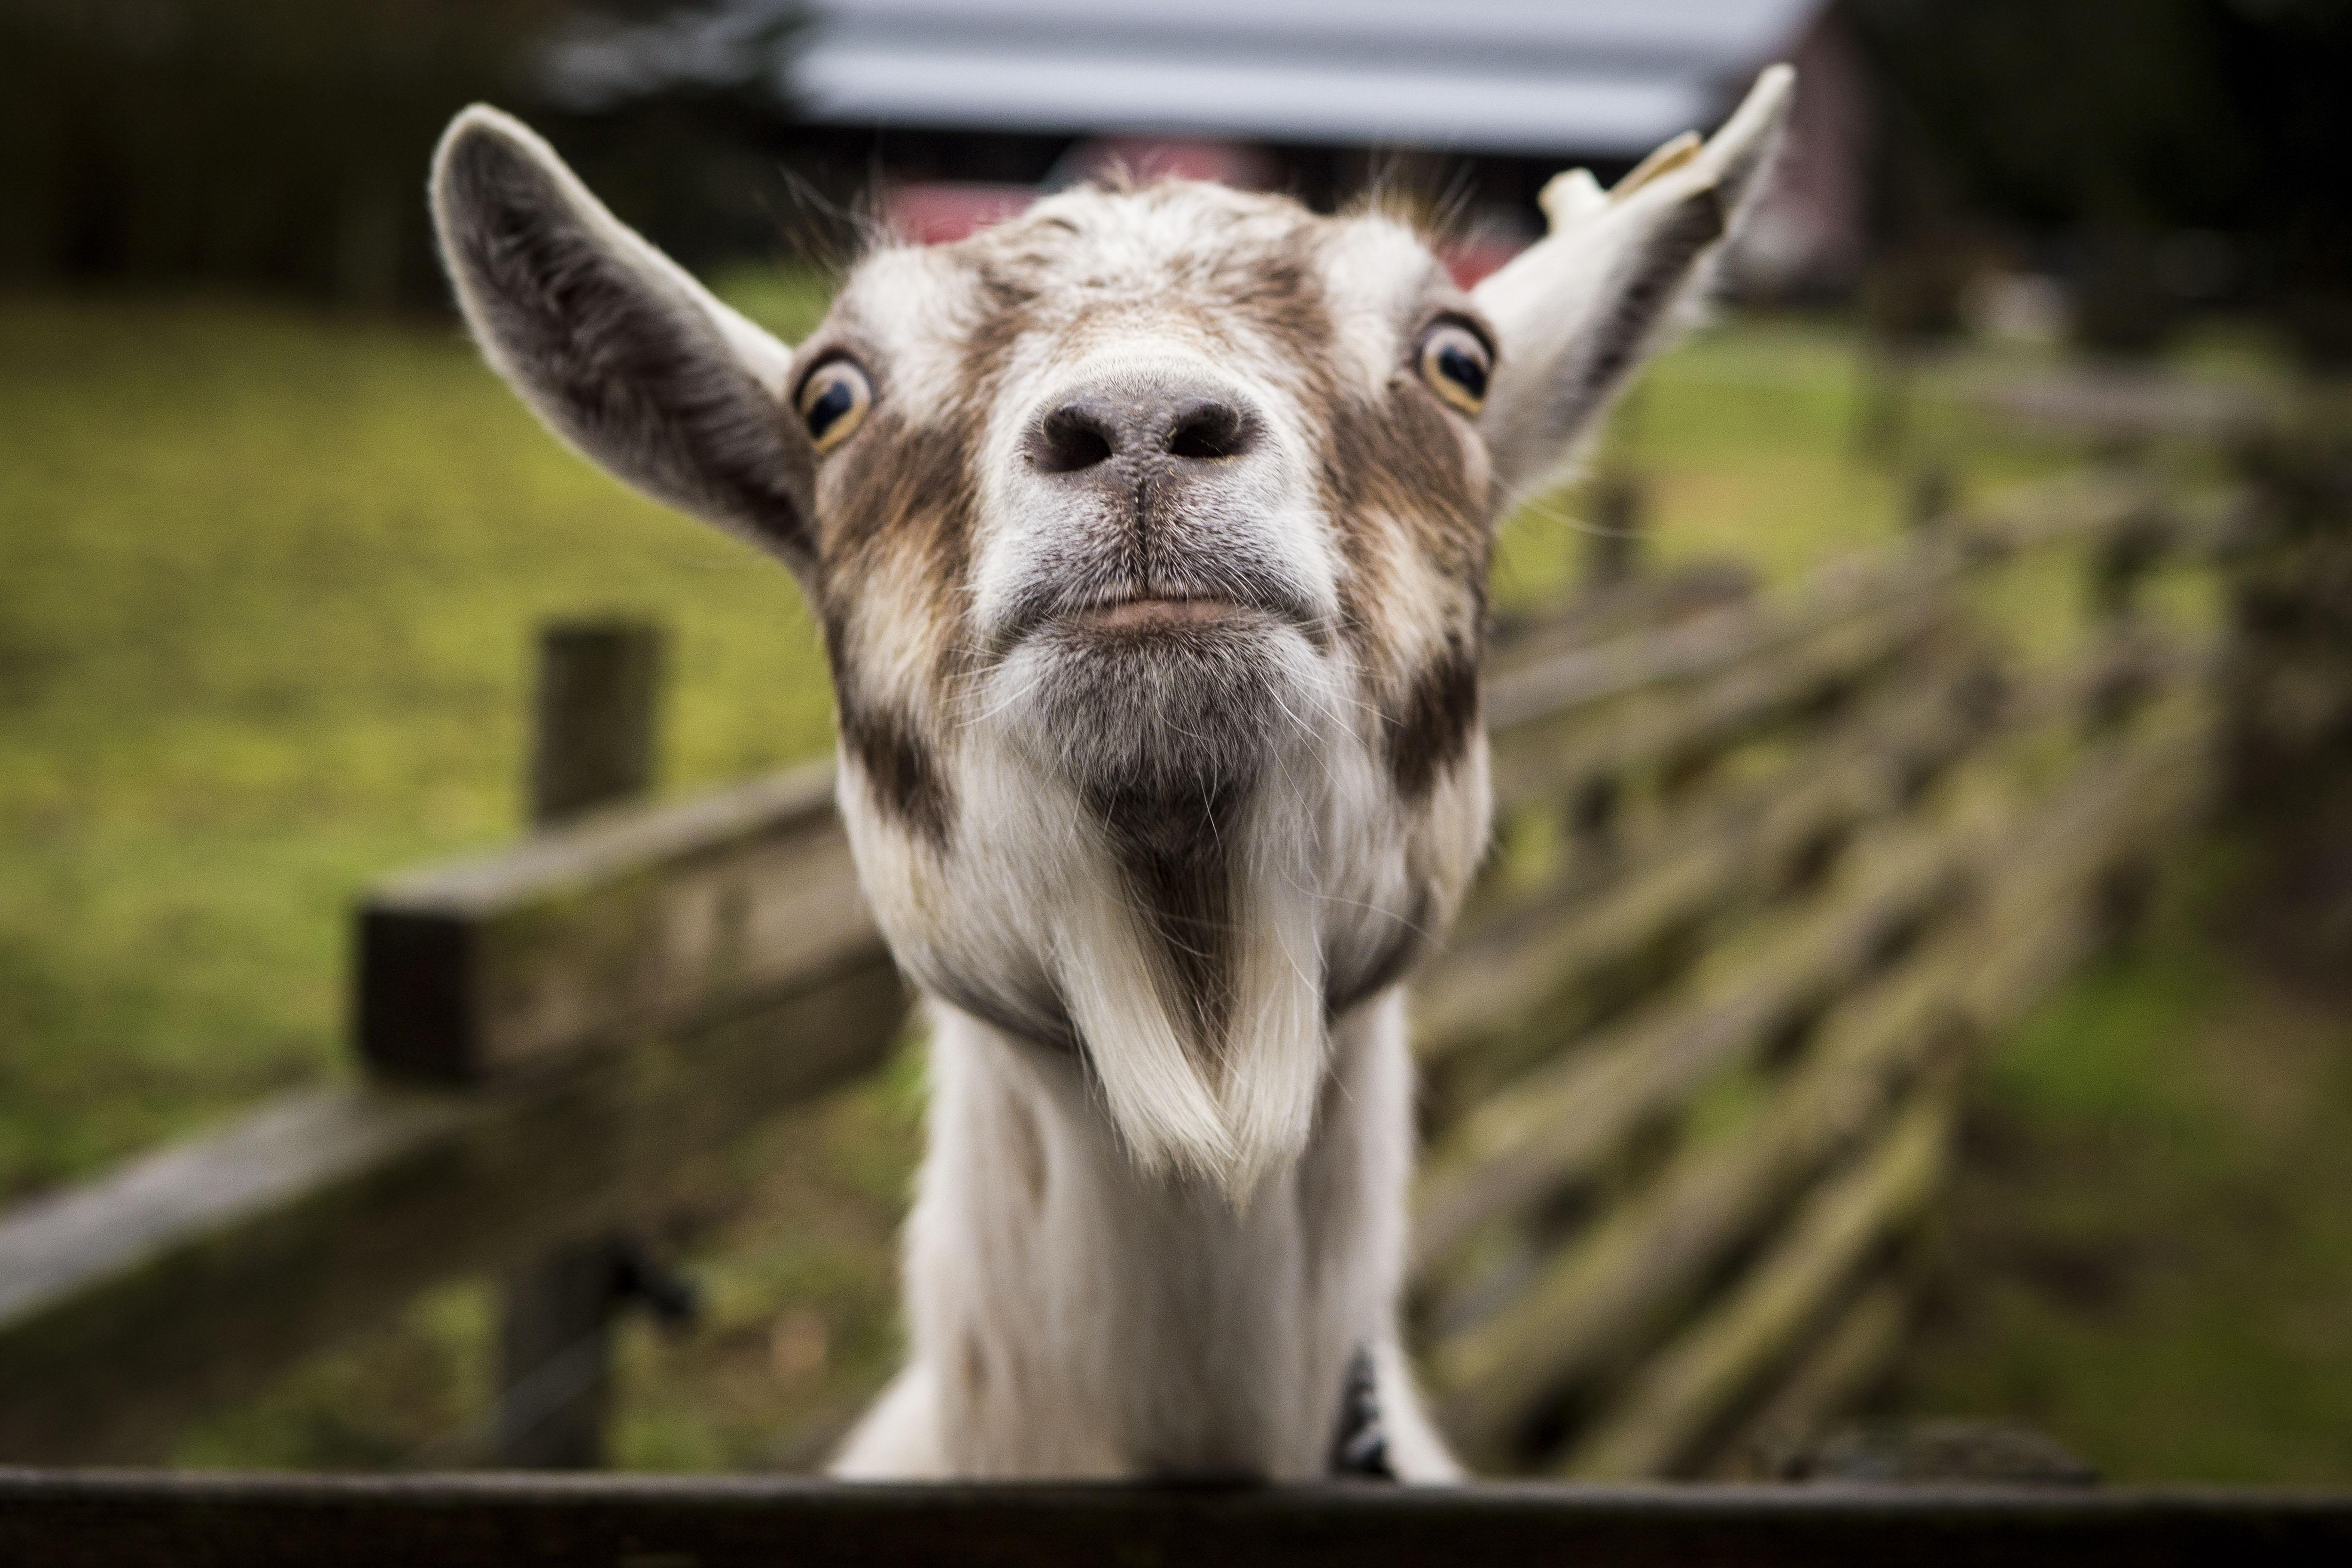 Fond d'écran : chèvre, museau, drôle 4999x3333 - 4kWallpaper - 1189300 - Fond d'écran - WallHere